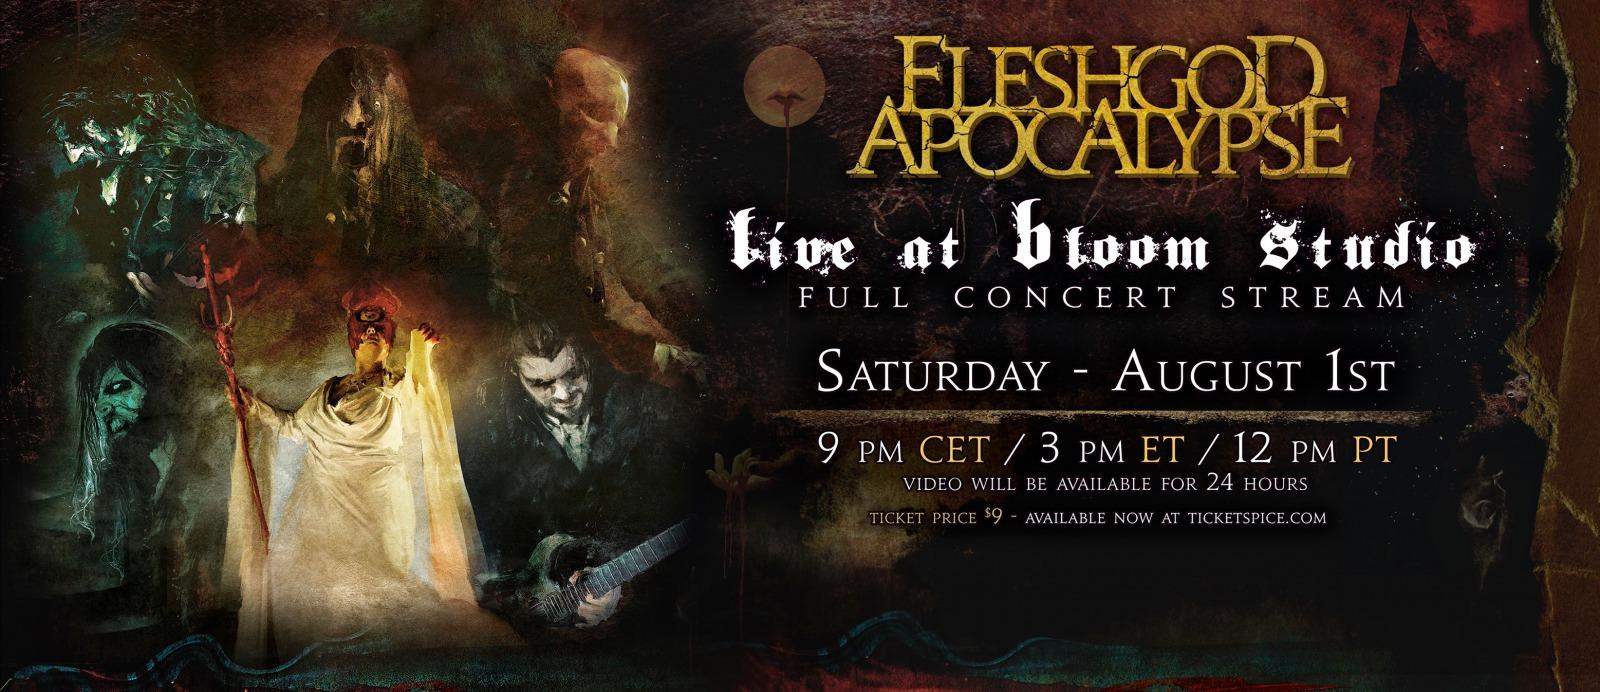 Fleshgod Apocalypse - Live at Bloom Studio